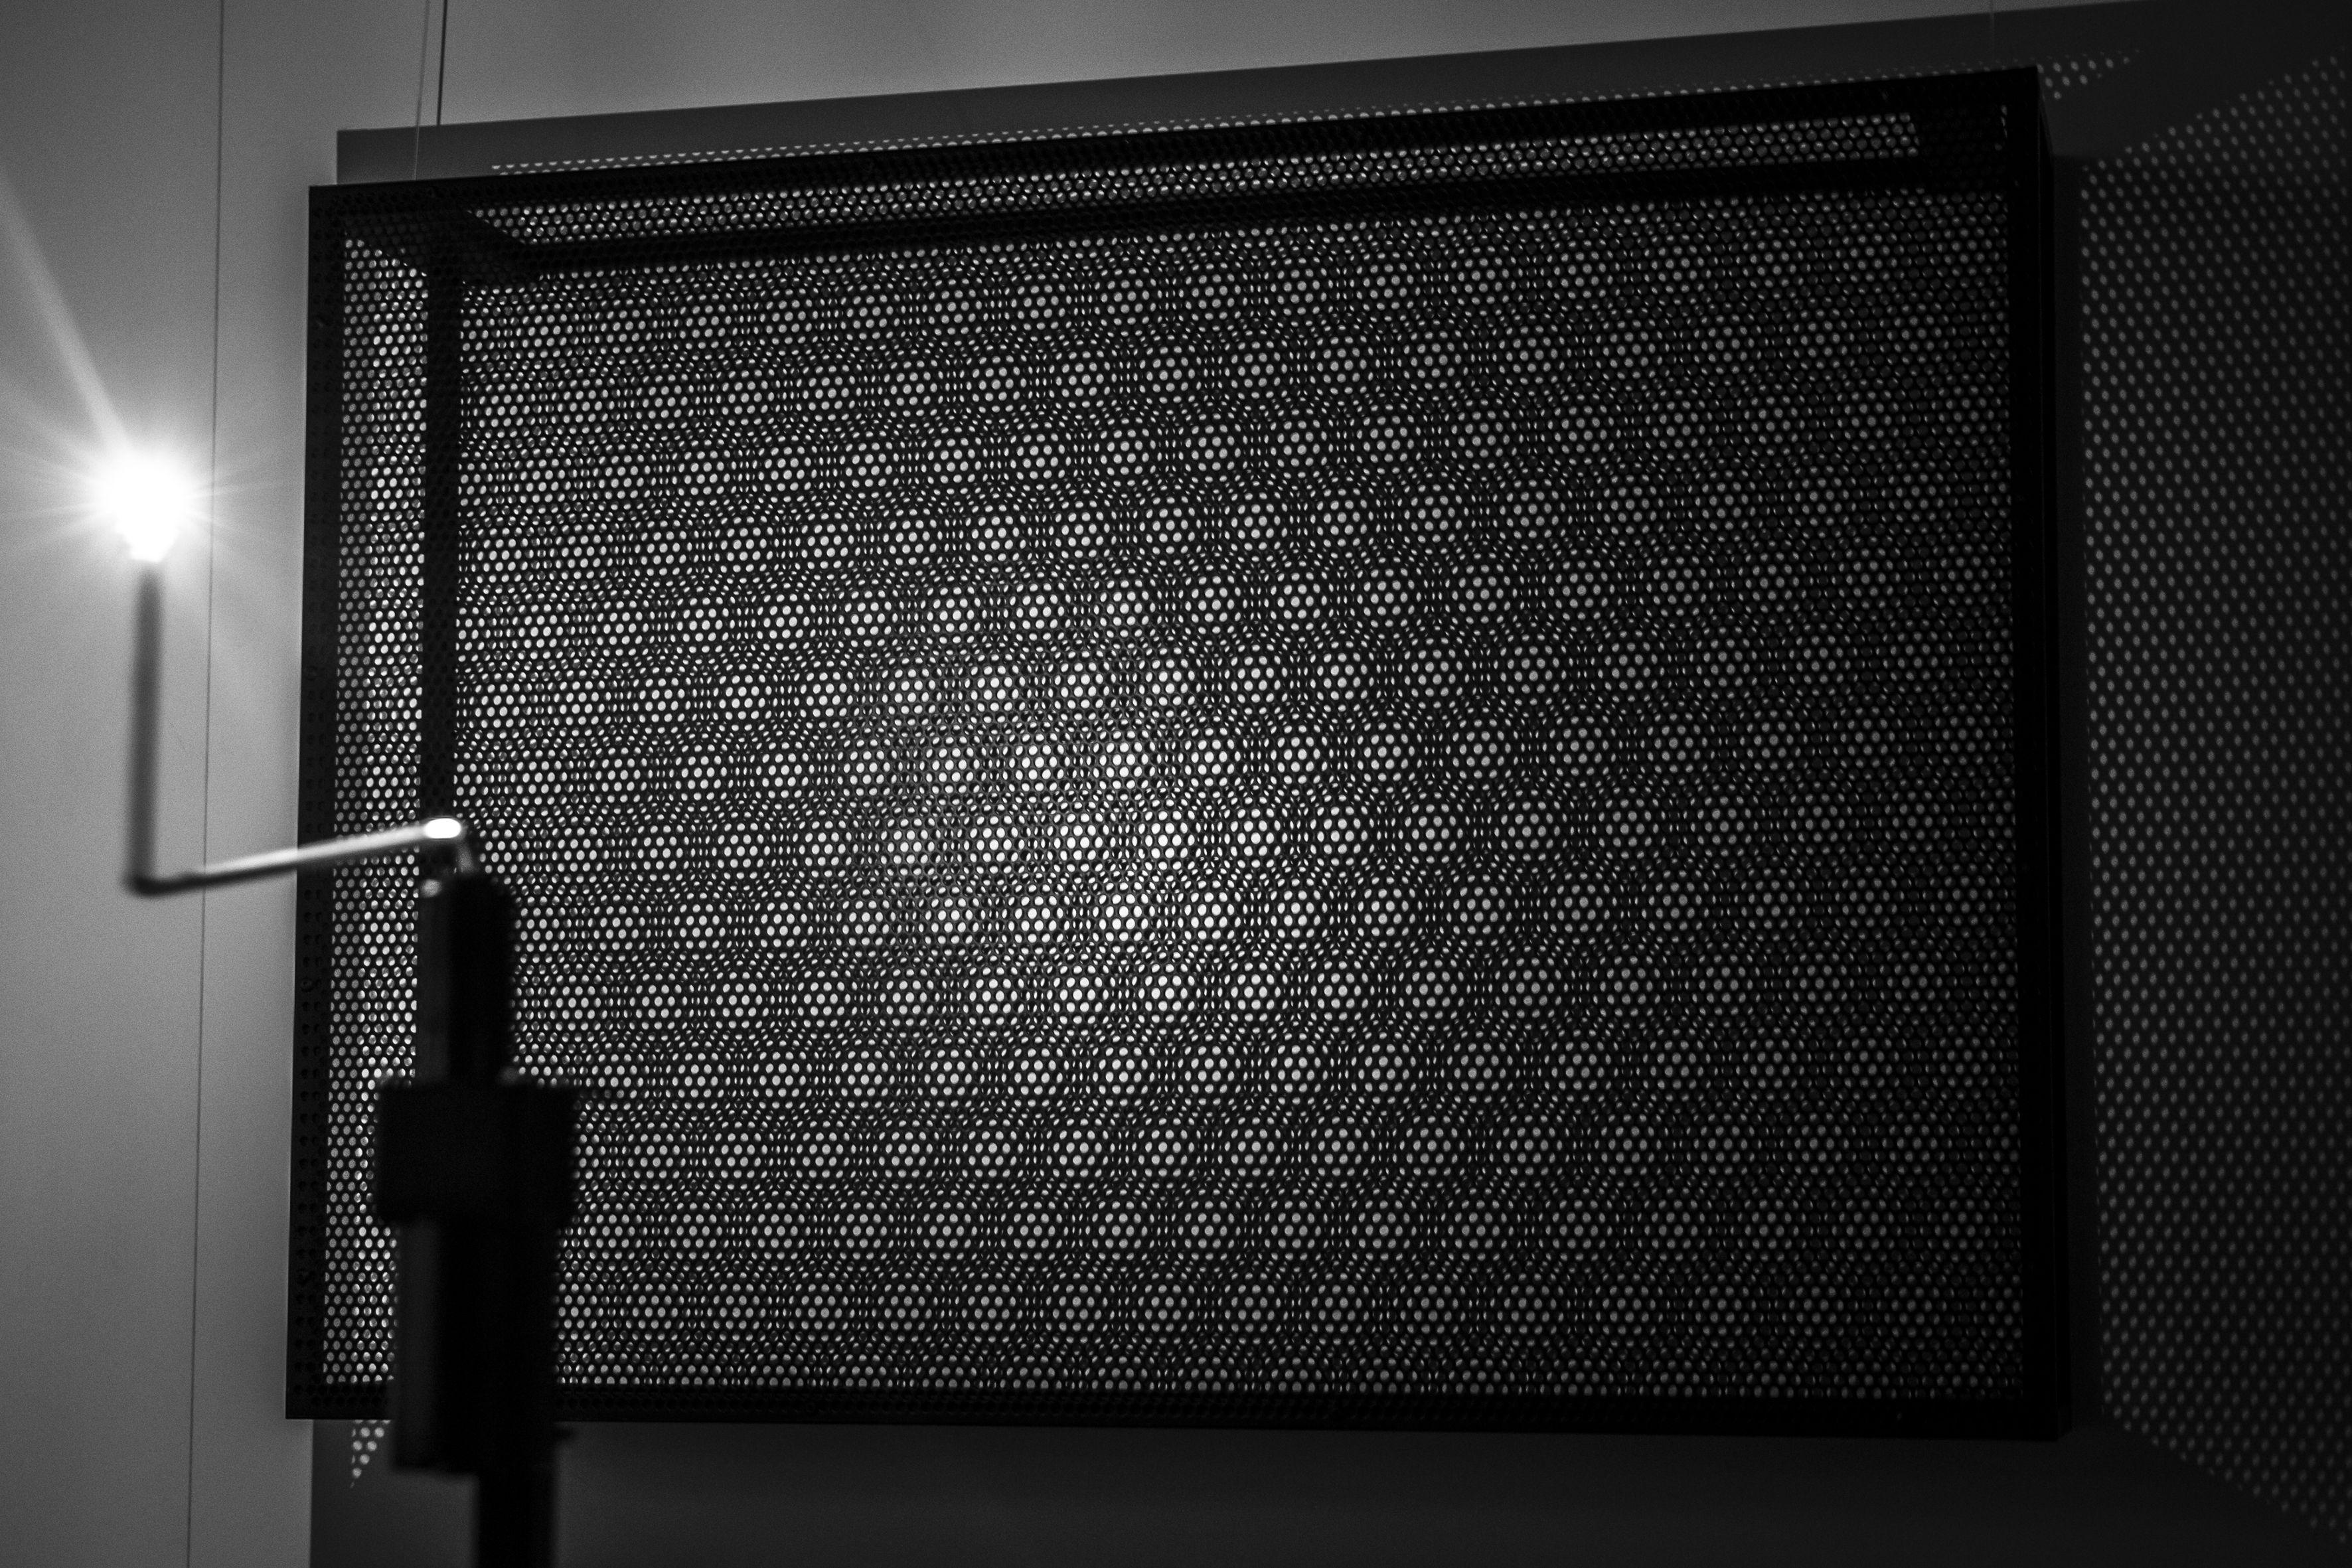 01_Moire Studies Nicky Assmann Joris Strijbos_cc Cloud Mine Photography_hires